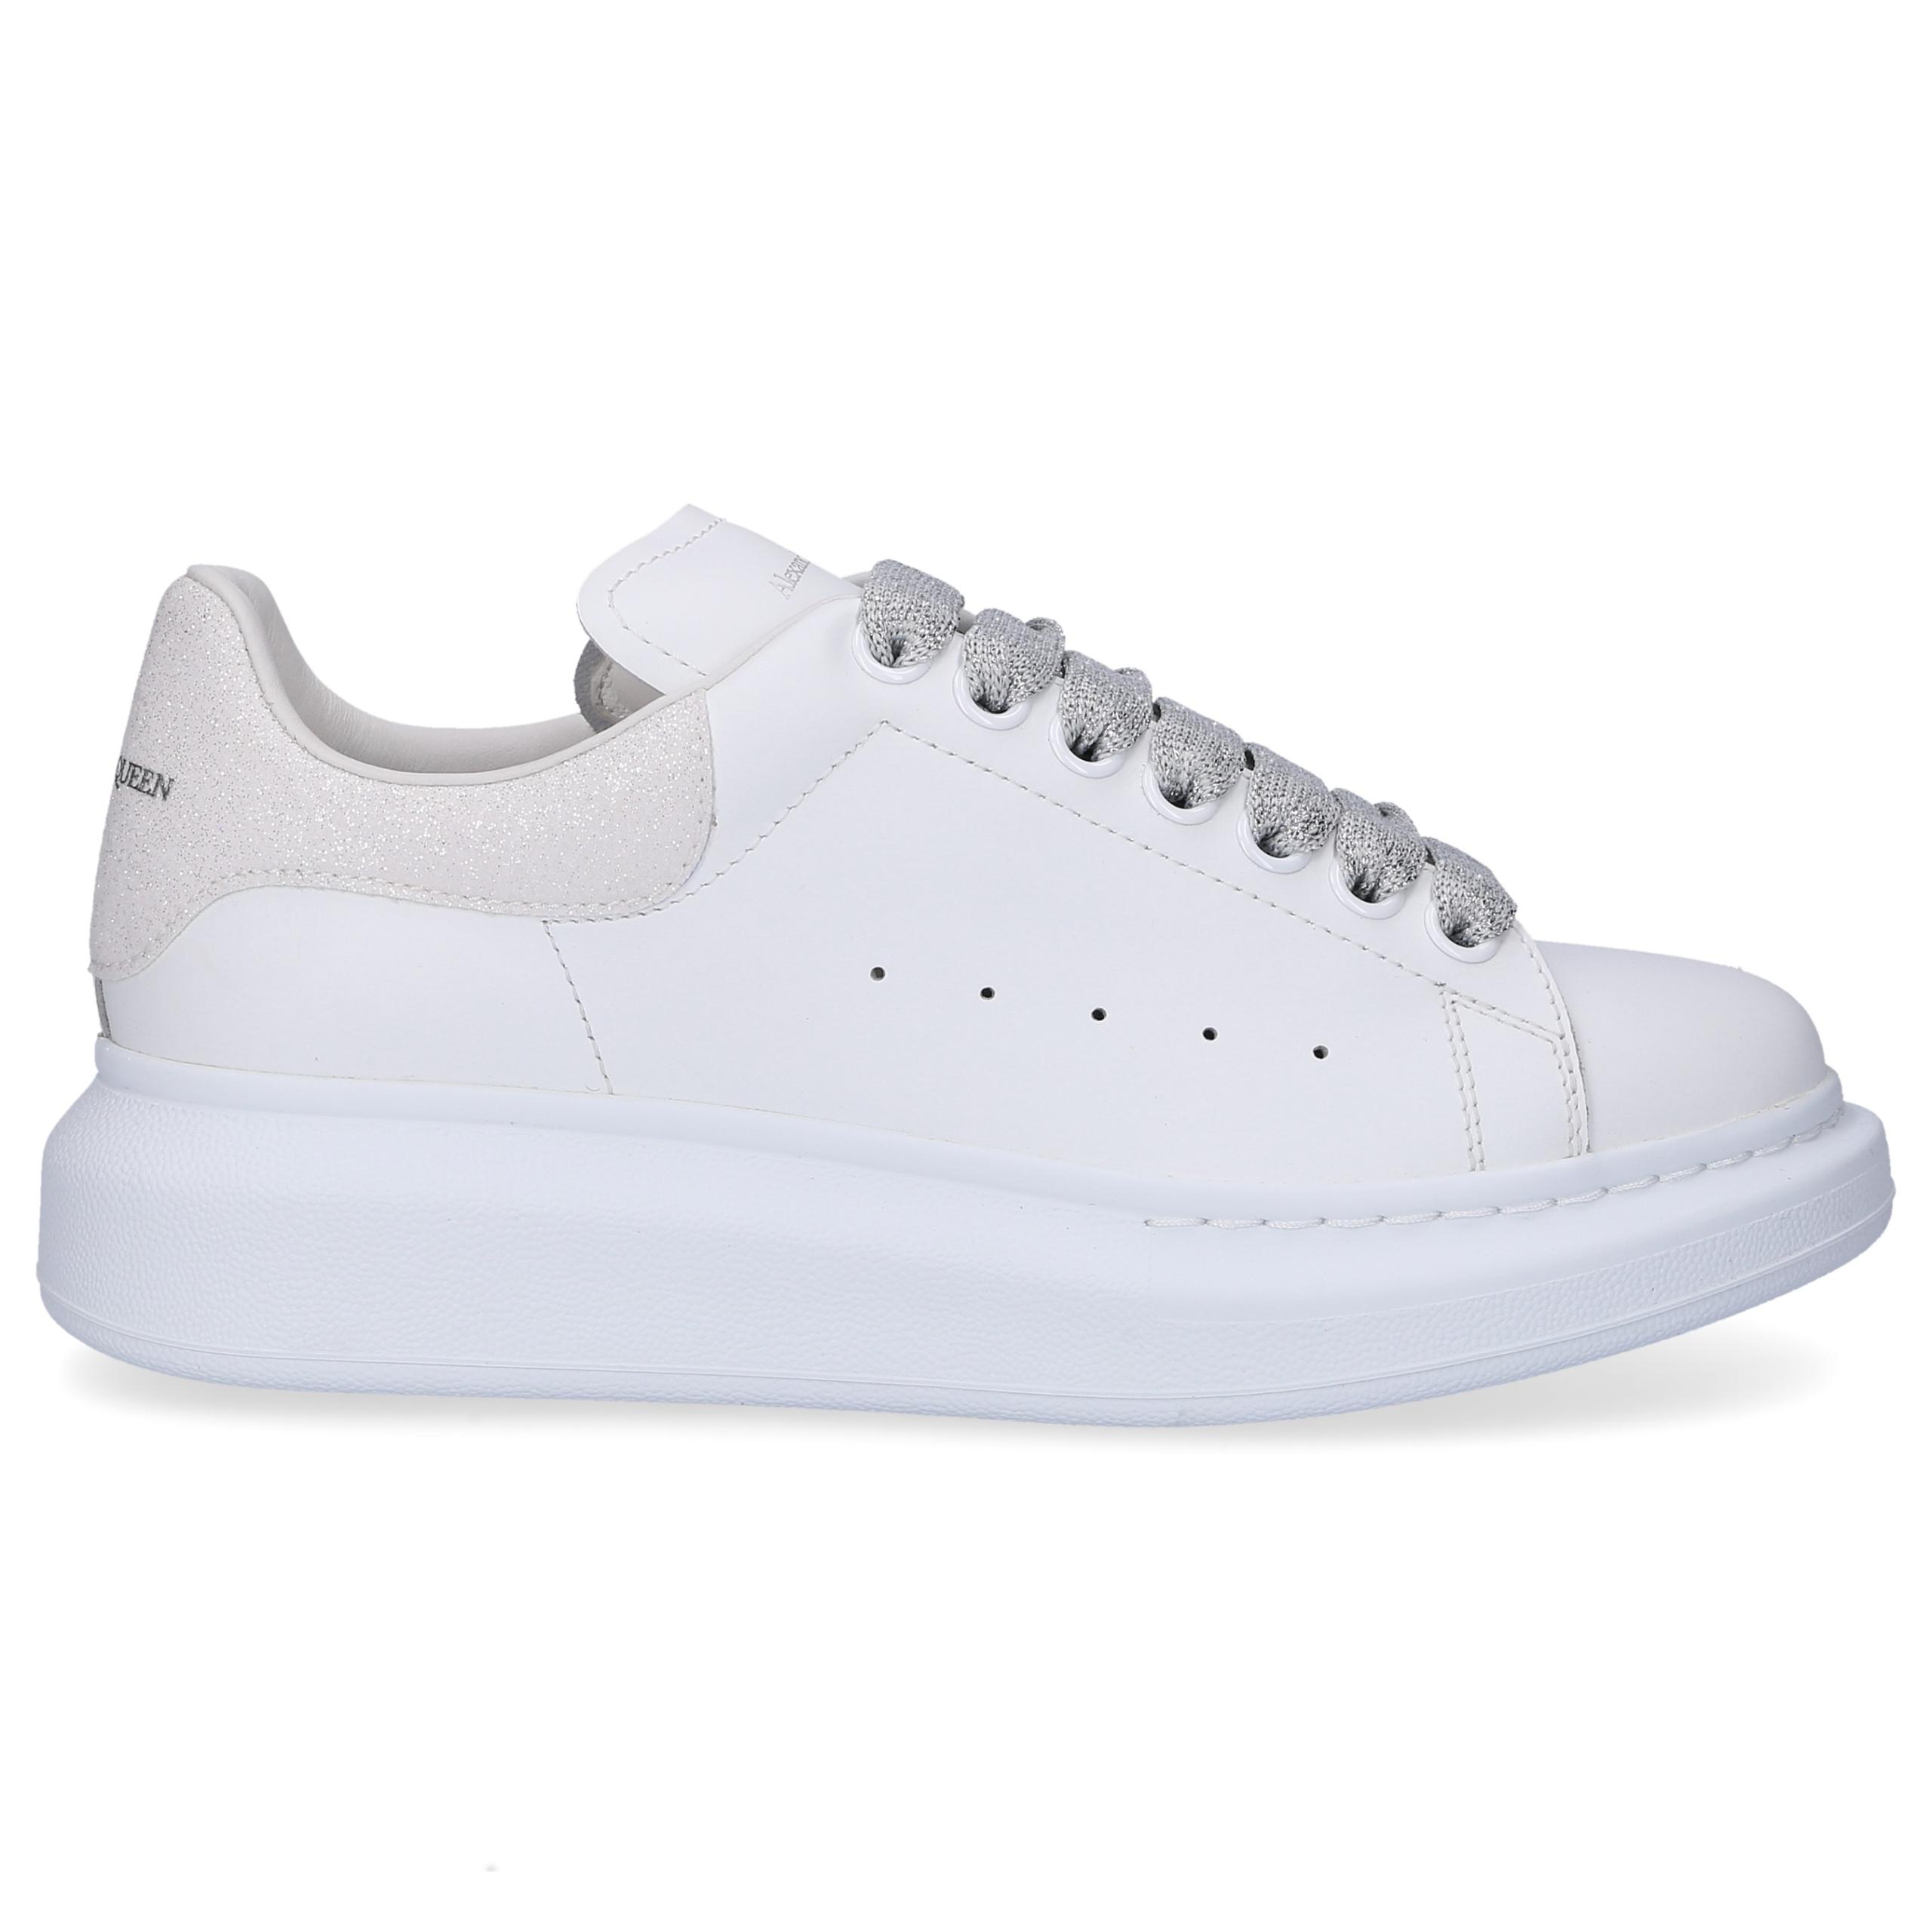 Sneaker low LARRY Kalbsleder Logo Glitzer weiß silber